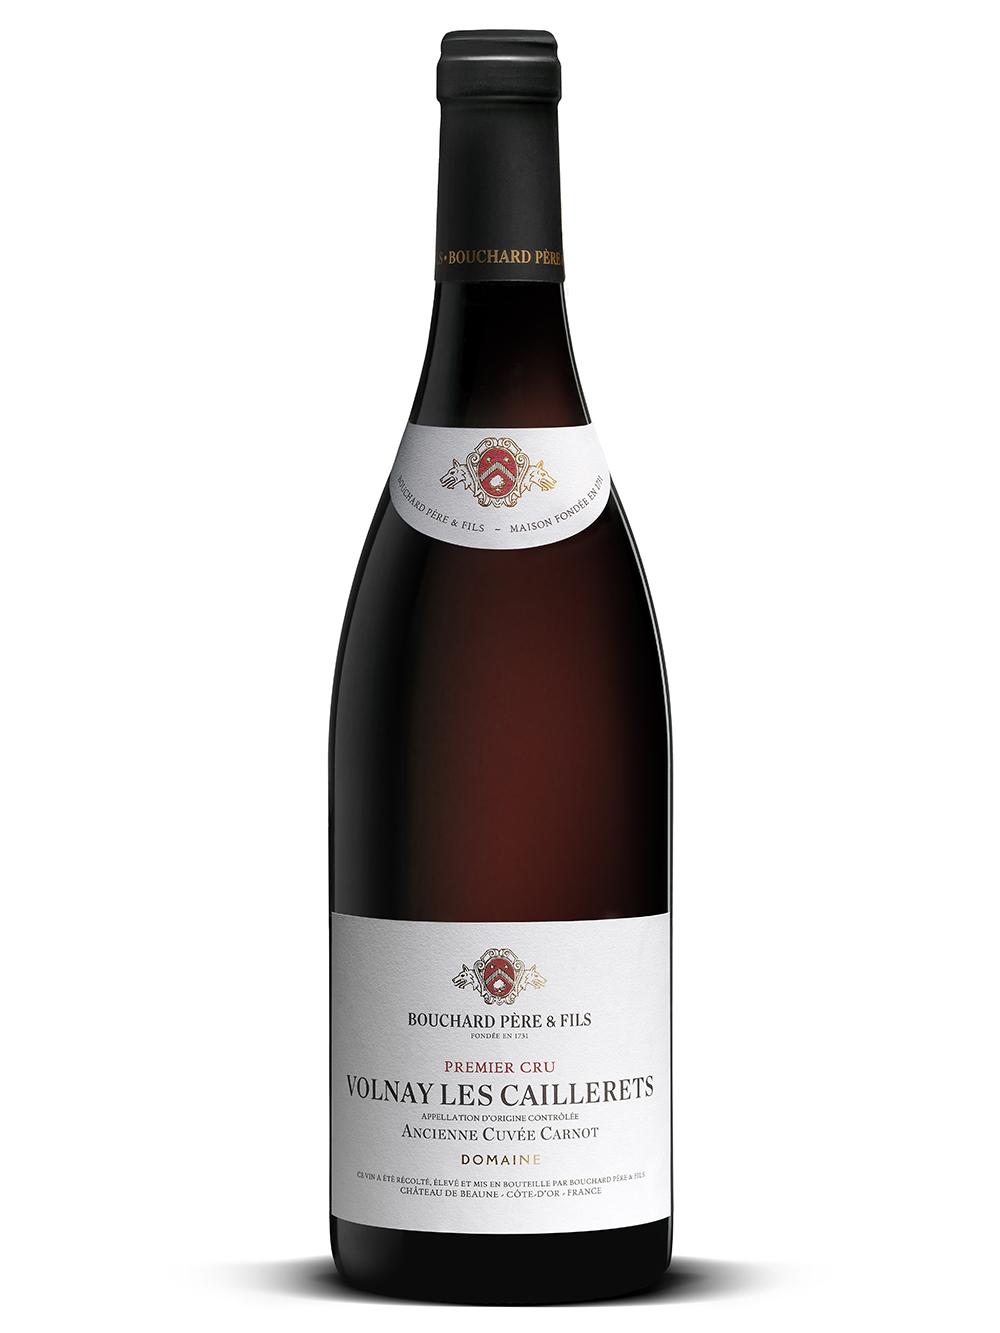 Volnay 1er Cru Les Caillerets Ancienne Cuvée Carnot